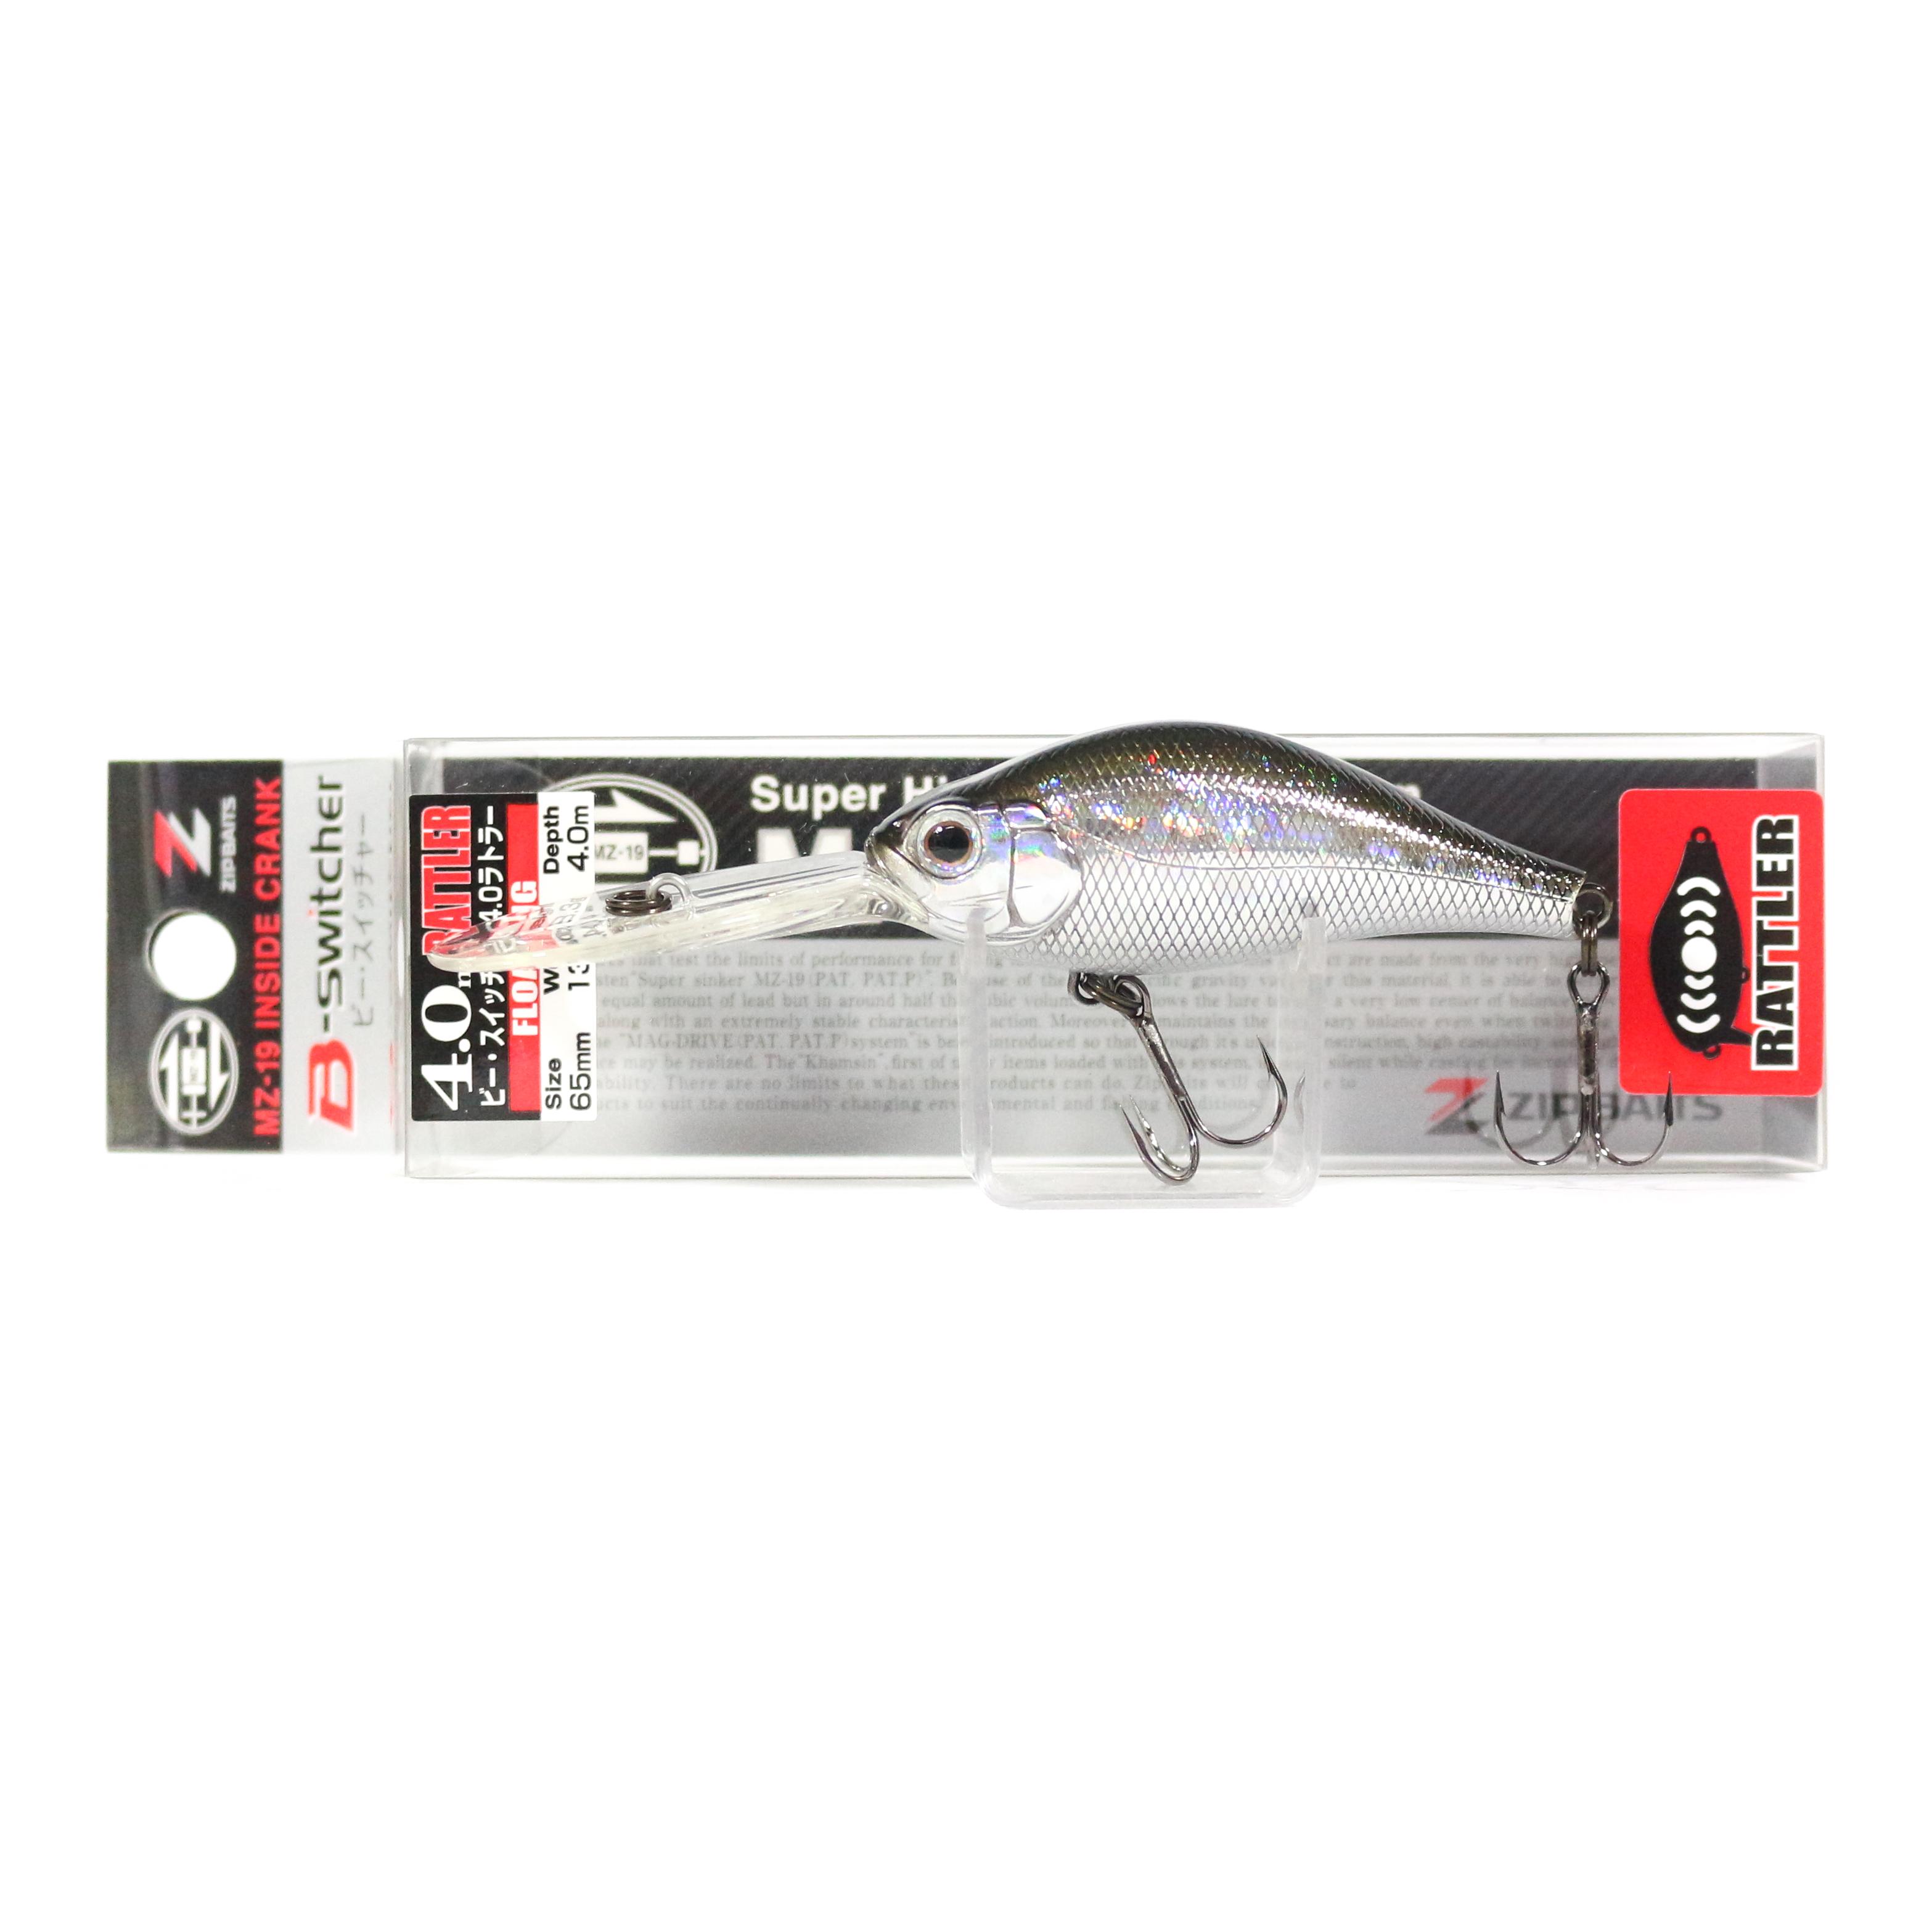 Zipbaits B Switcher 4.0 Rattler 65mm Floating Lure 510 (1095)